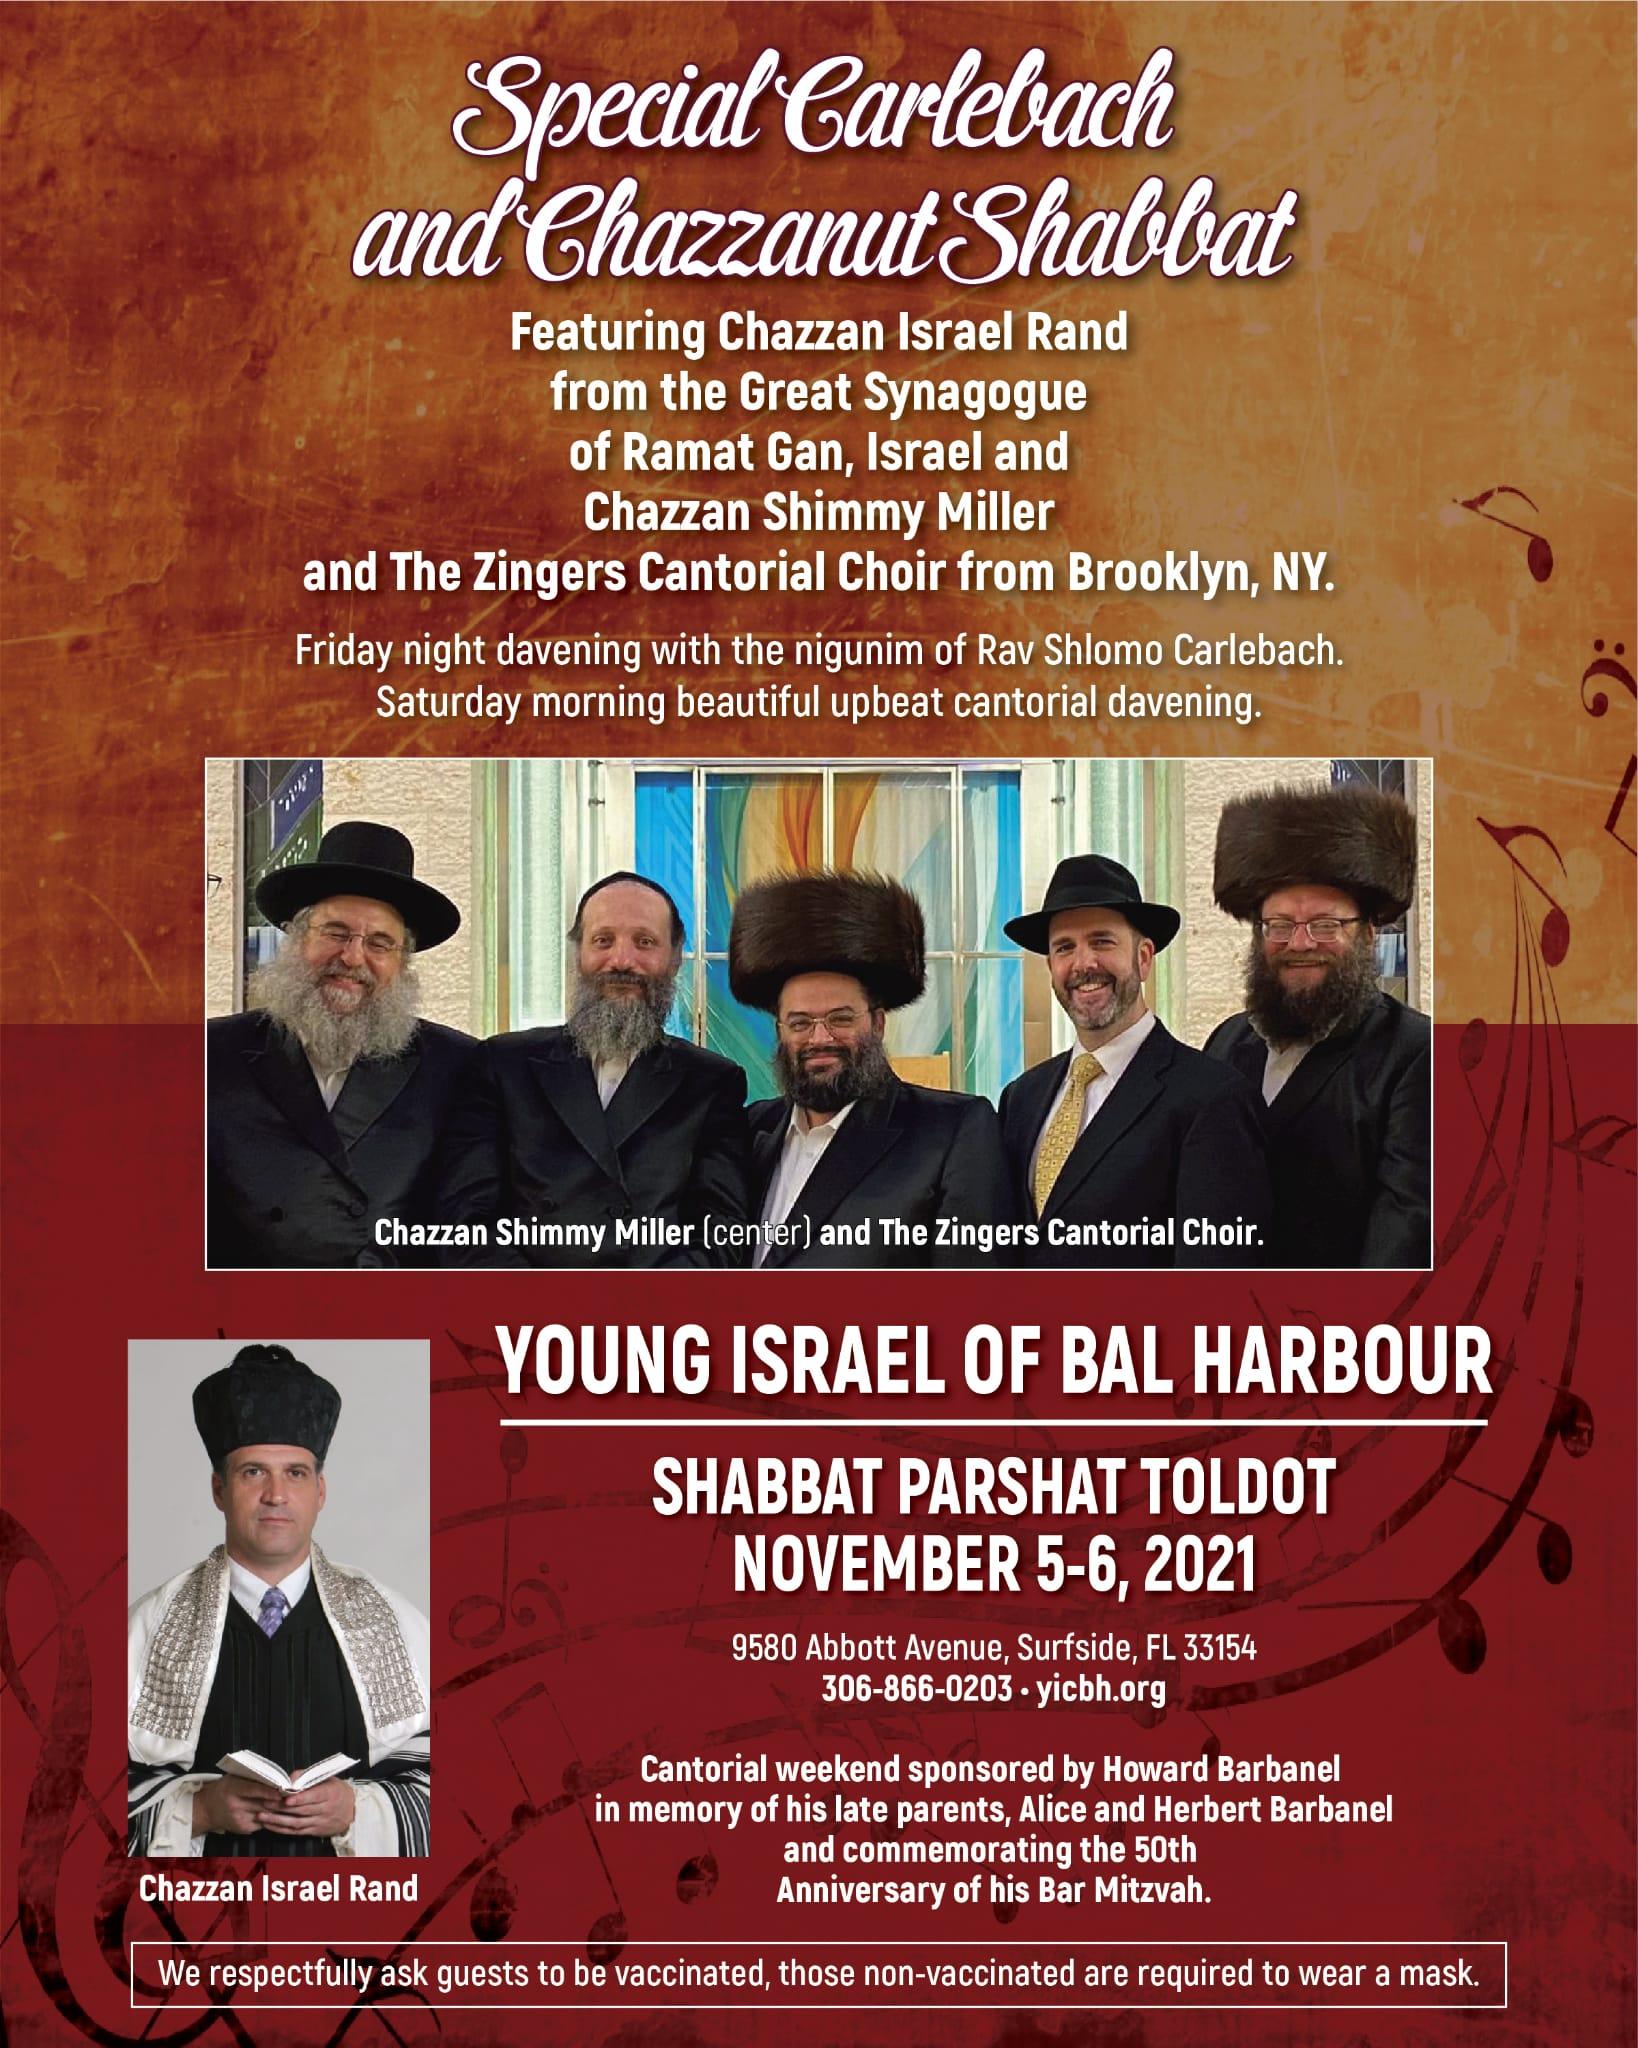 Banner Image for Carlebach and Chazzanut Shabbat